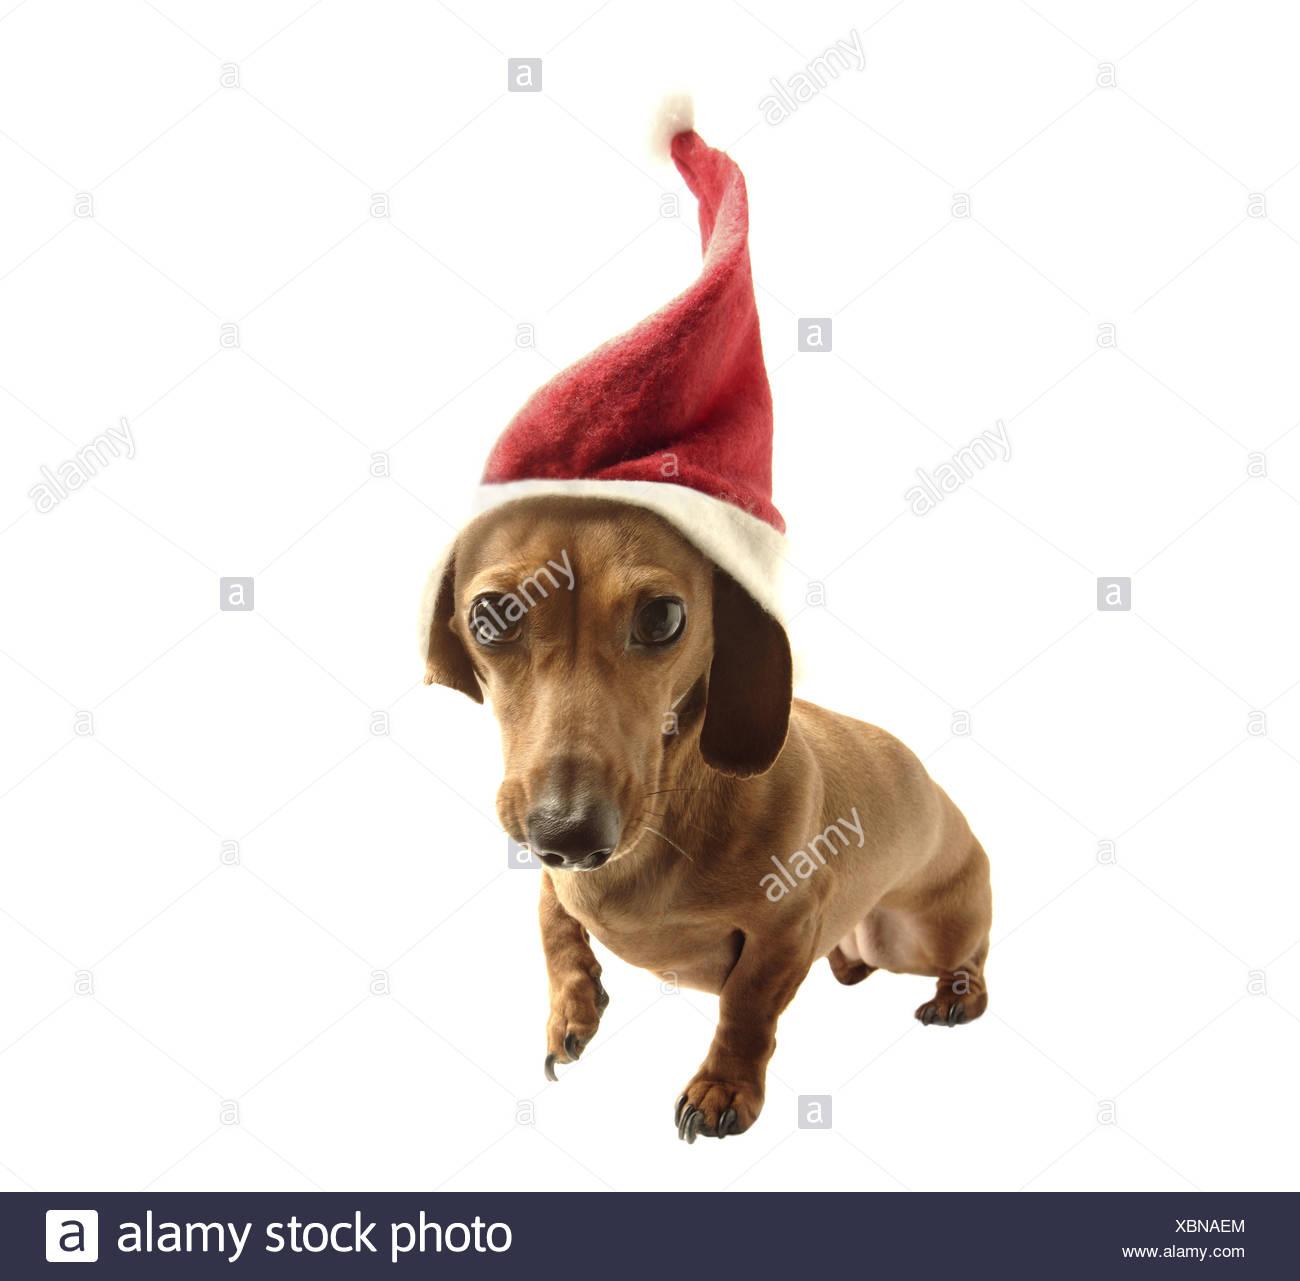 Dachshund in Santa hat - Stock Image